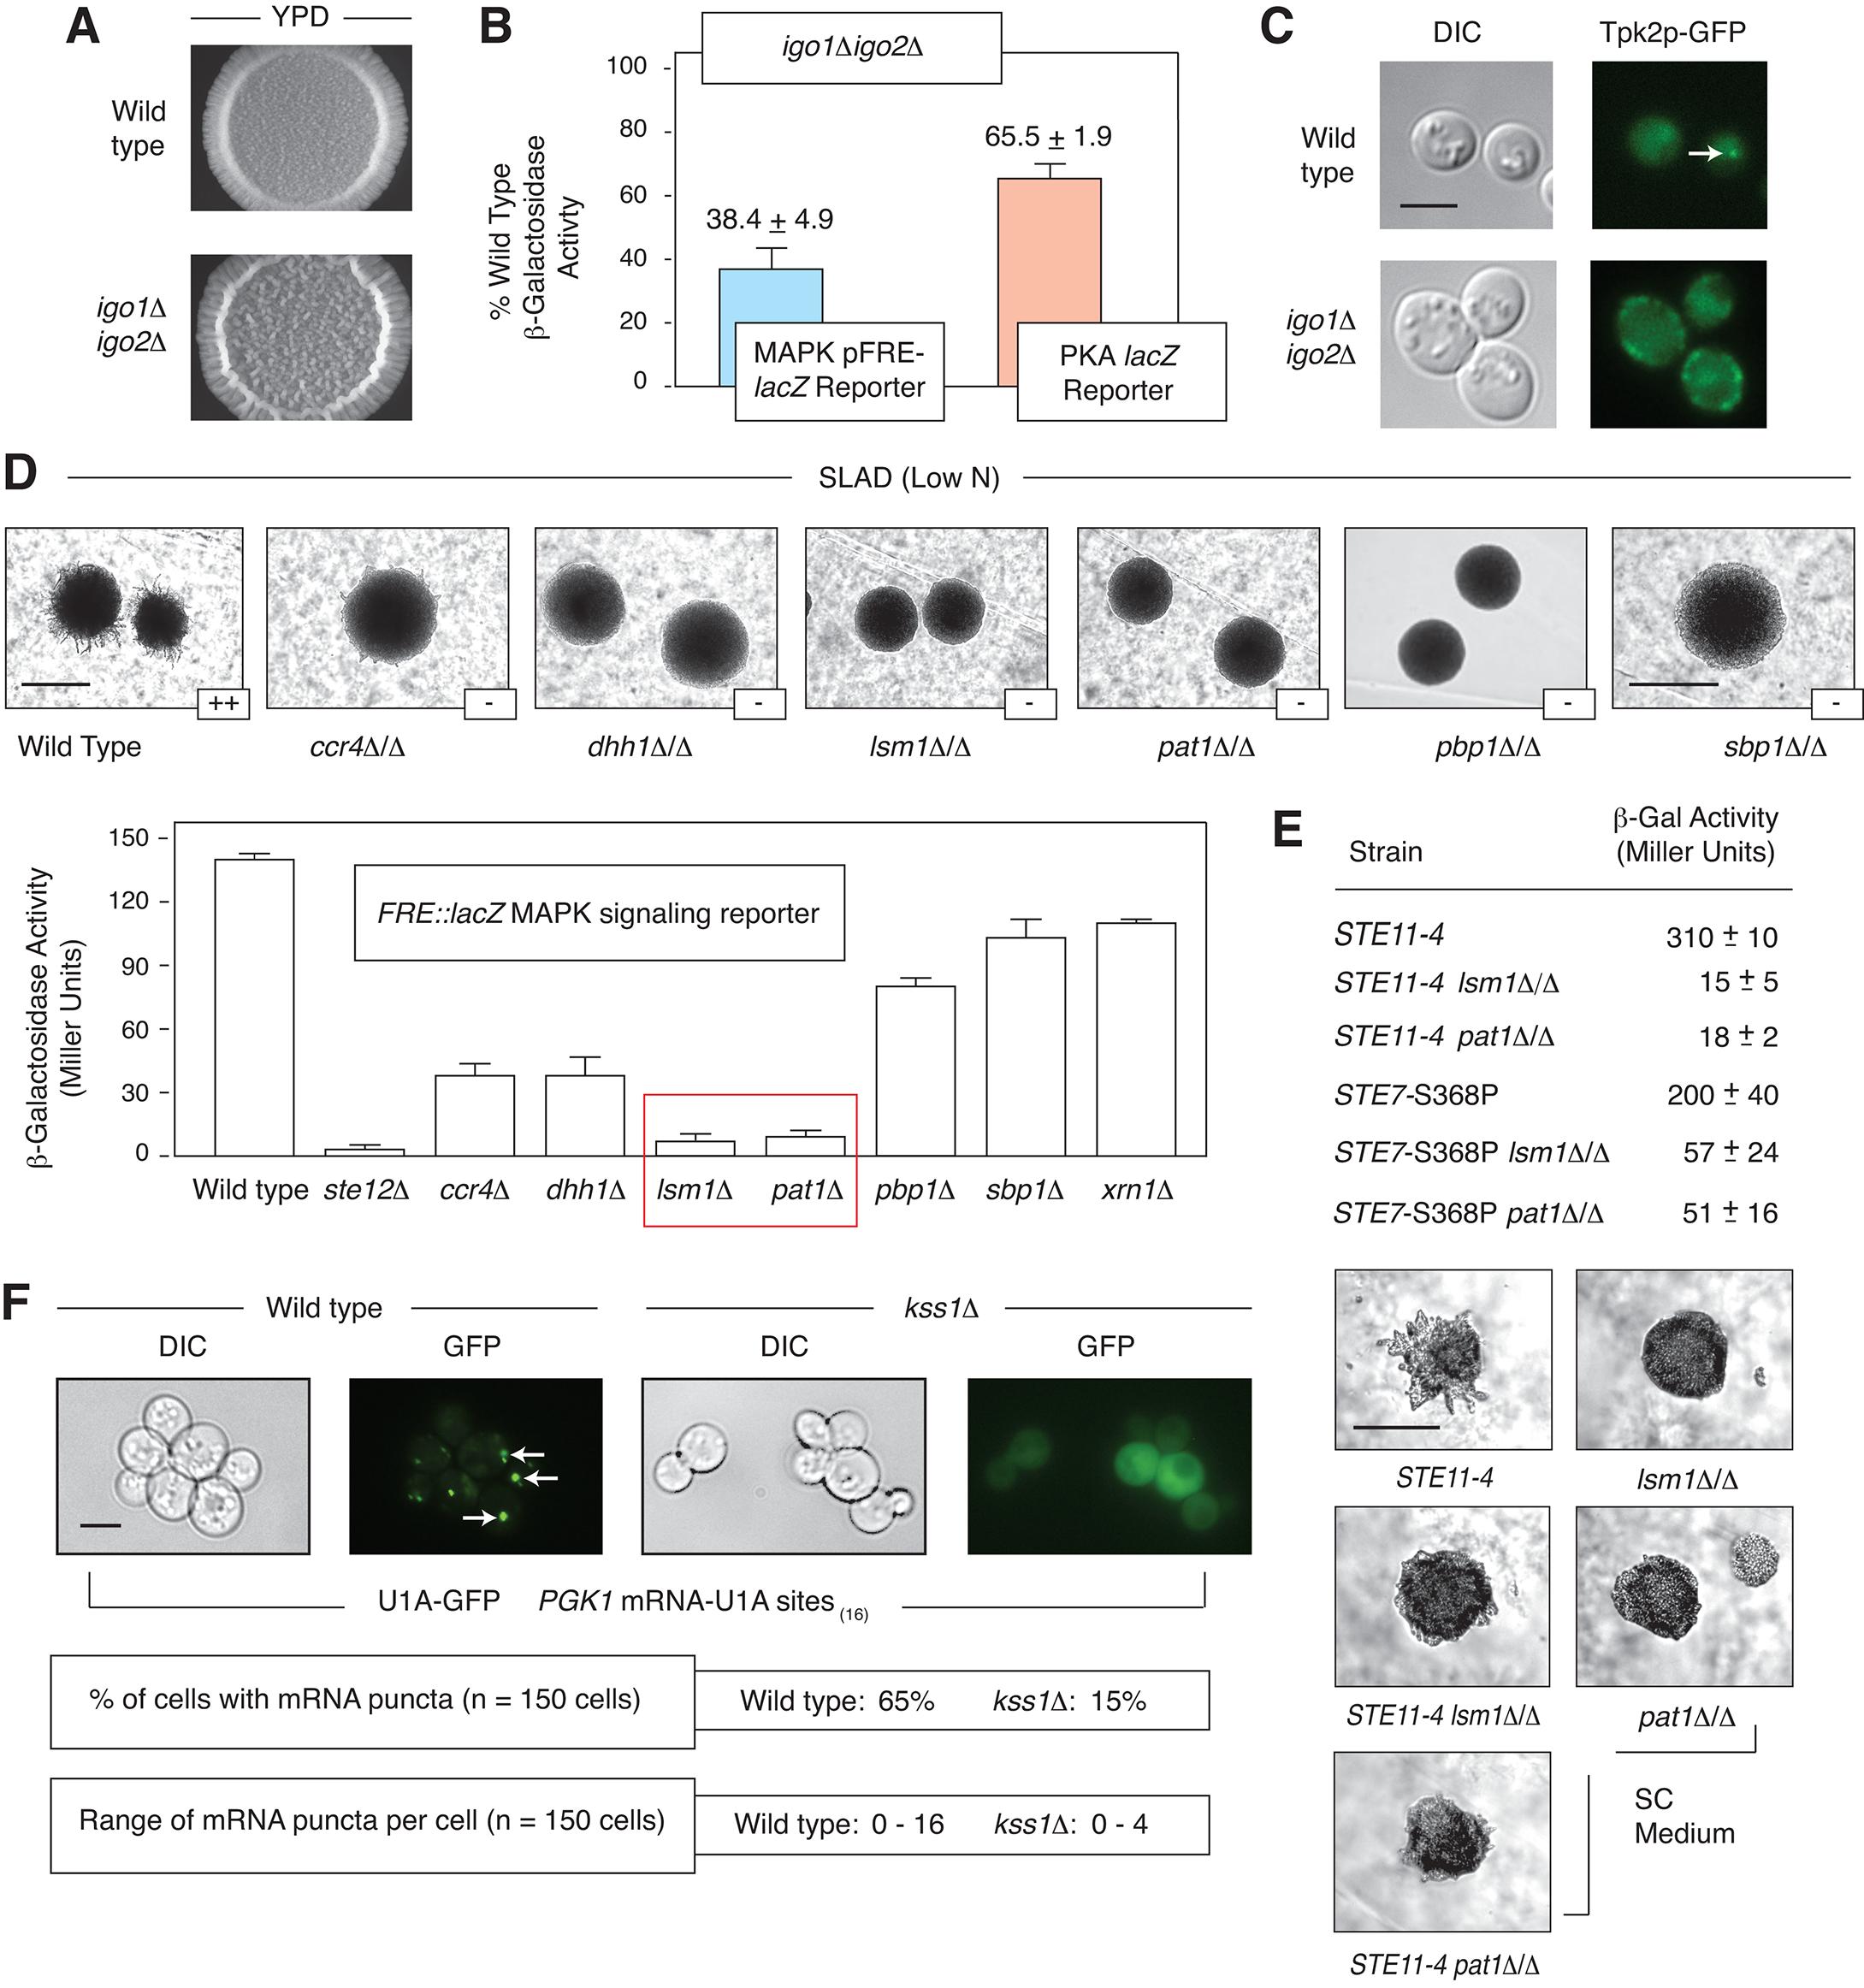 Interrelationship between mRNP components, PKA, and pseudohyphal growth MAPK signaling.